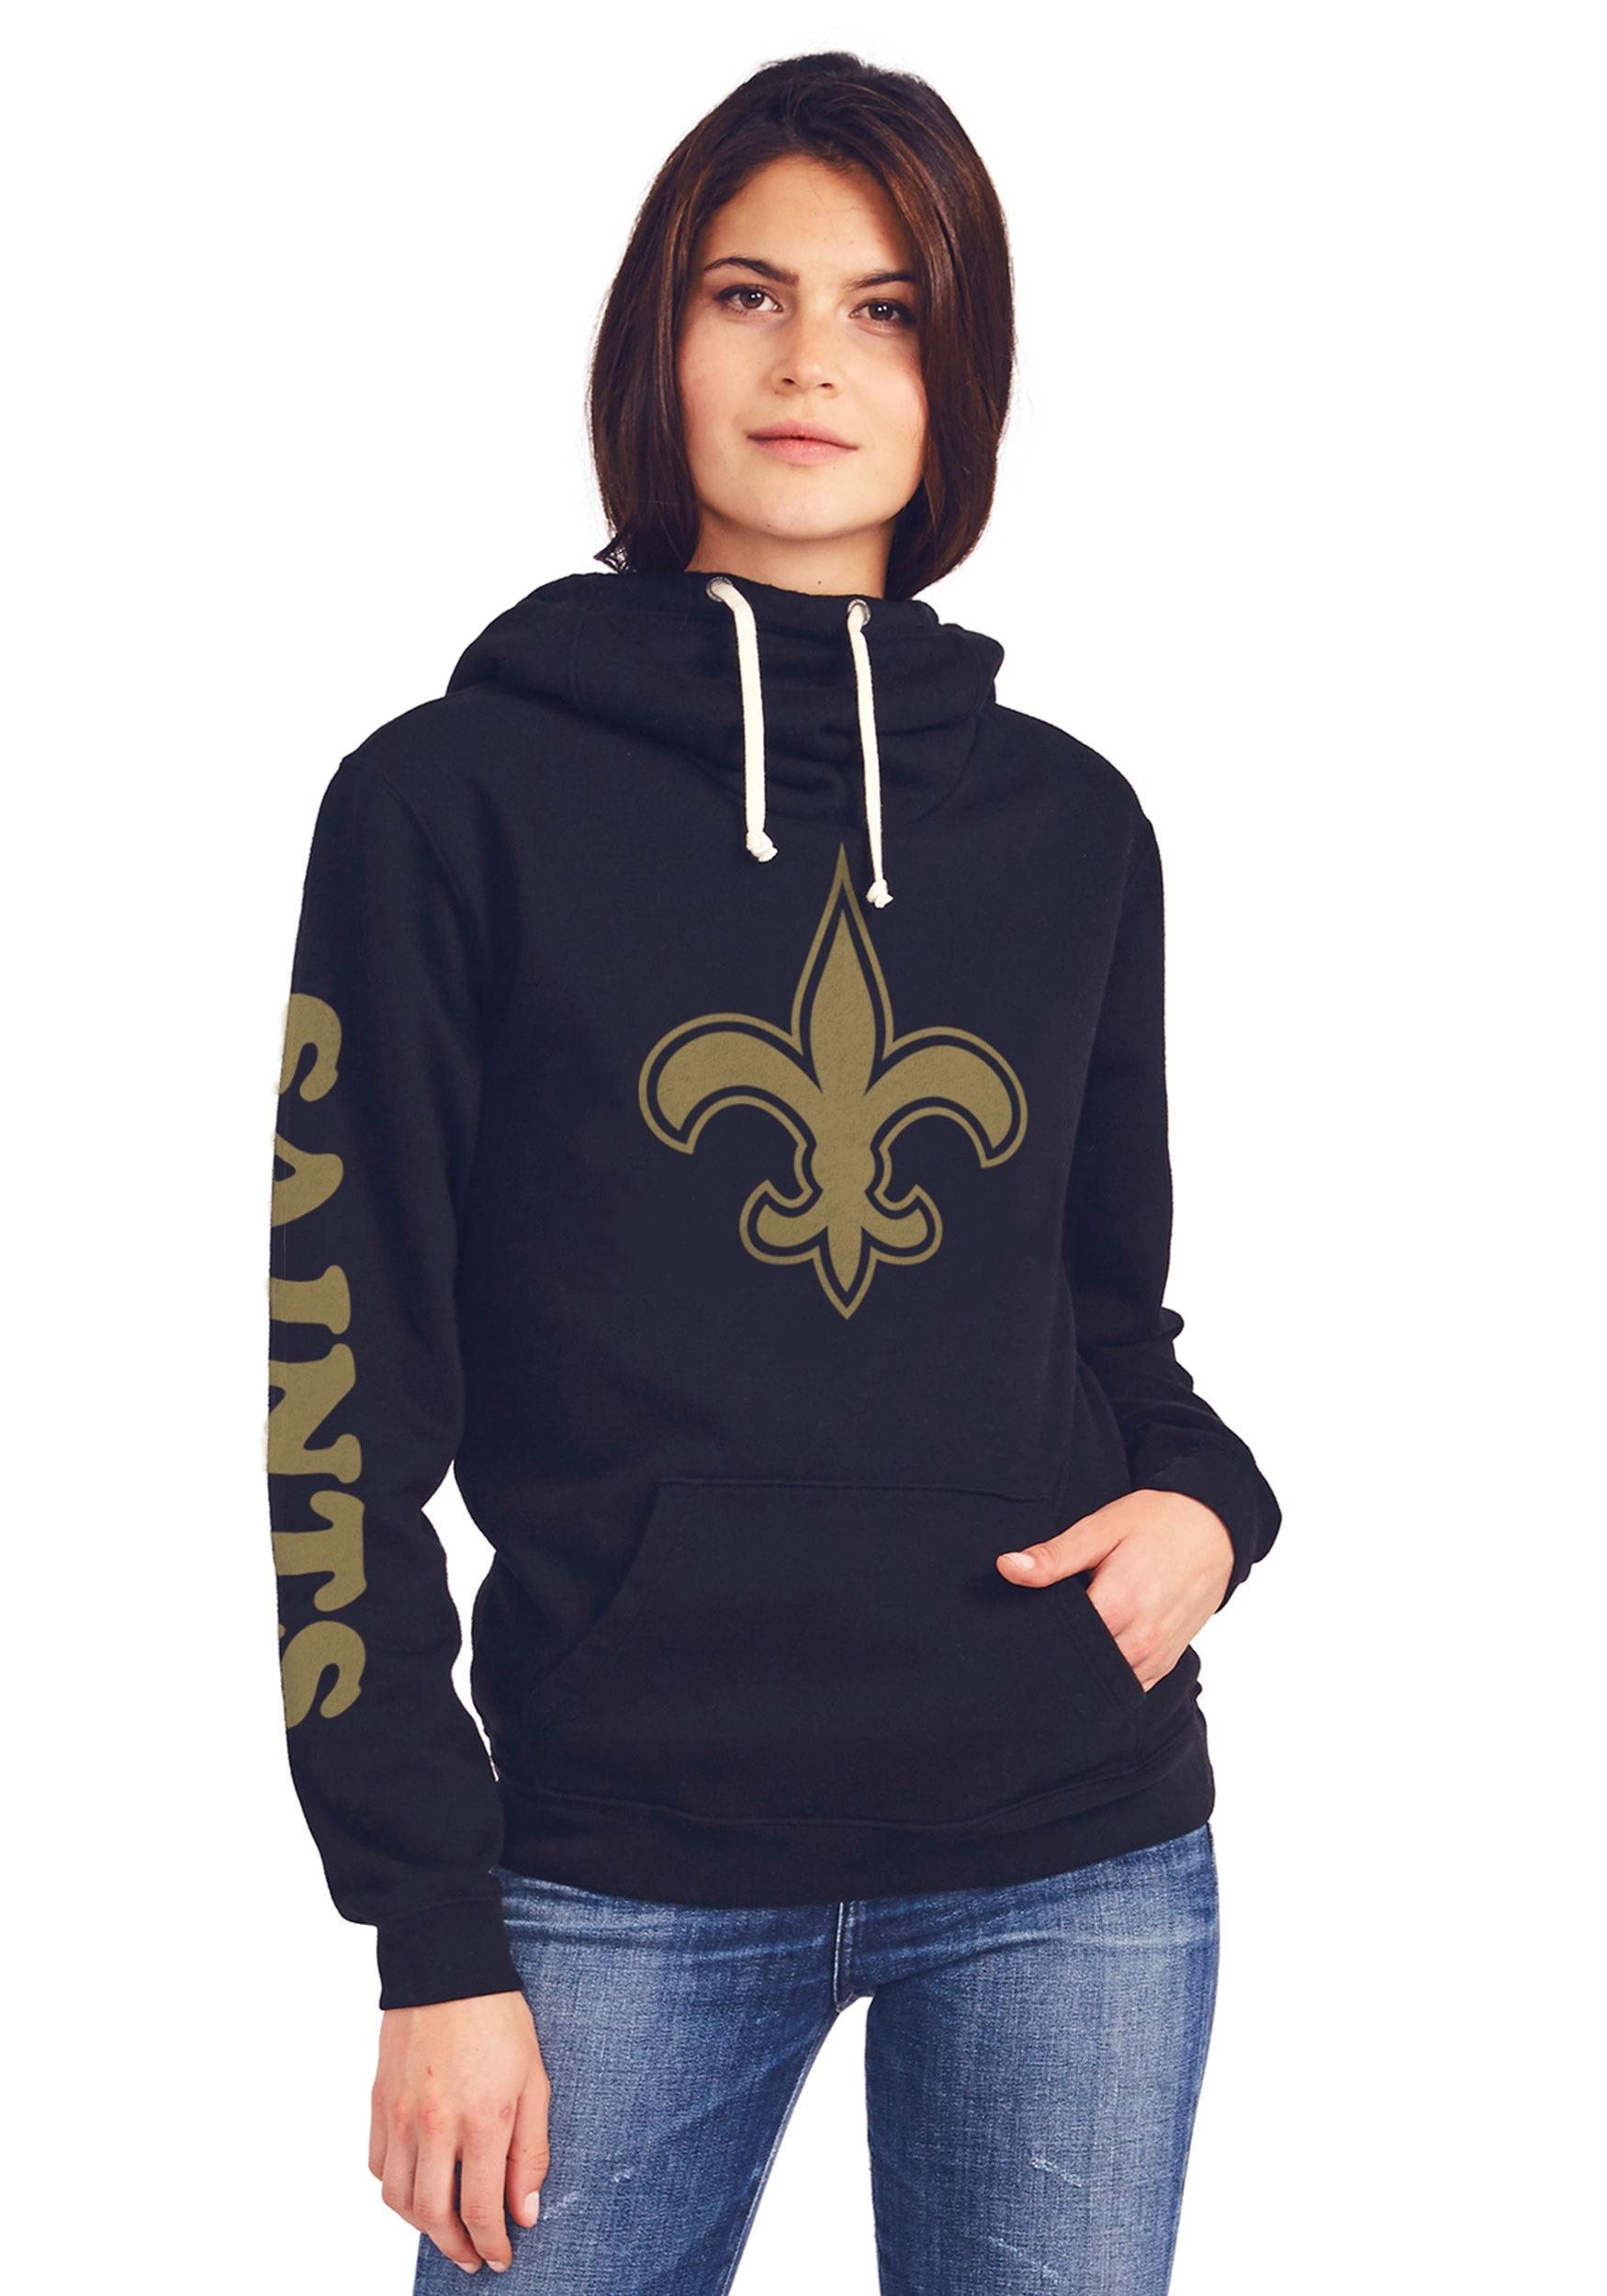 New Orleans Saints Women's Cowl Neck Hooded Sweatshirt